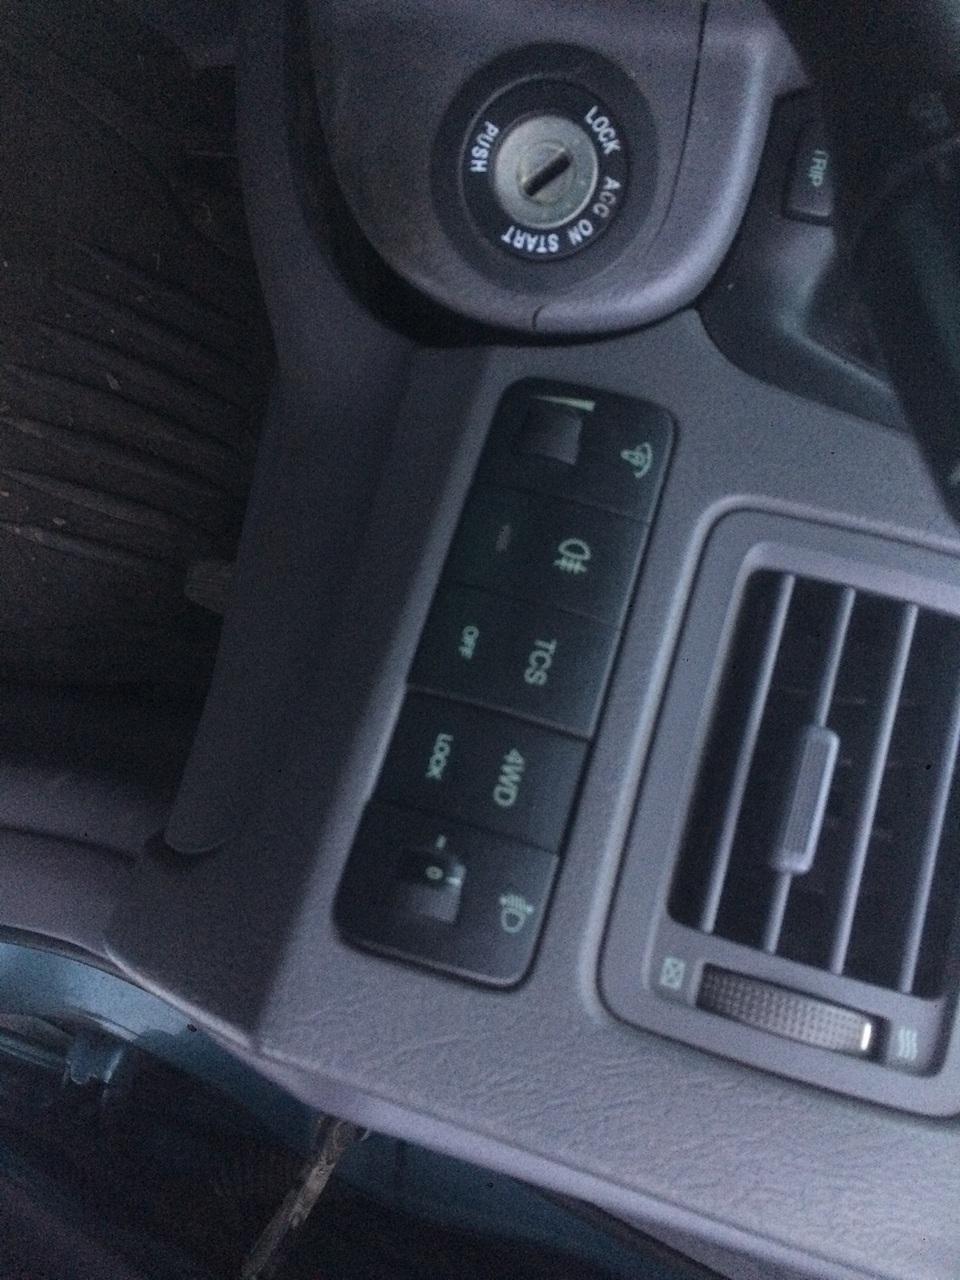 Dezmembrez Hyundai Tucson 2,0 crdi 4x4 2006